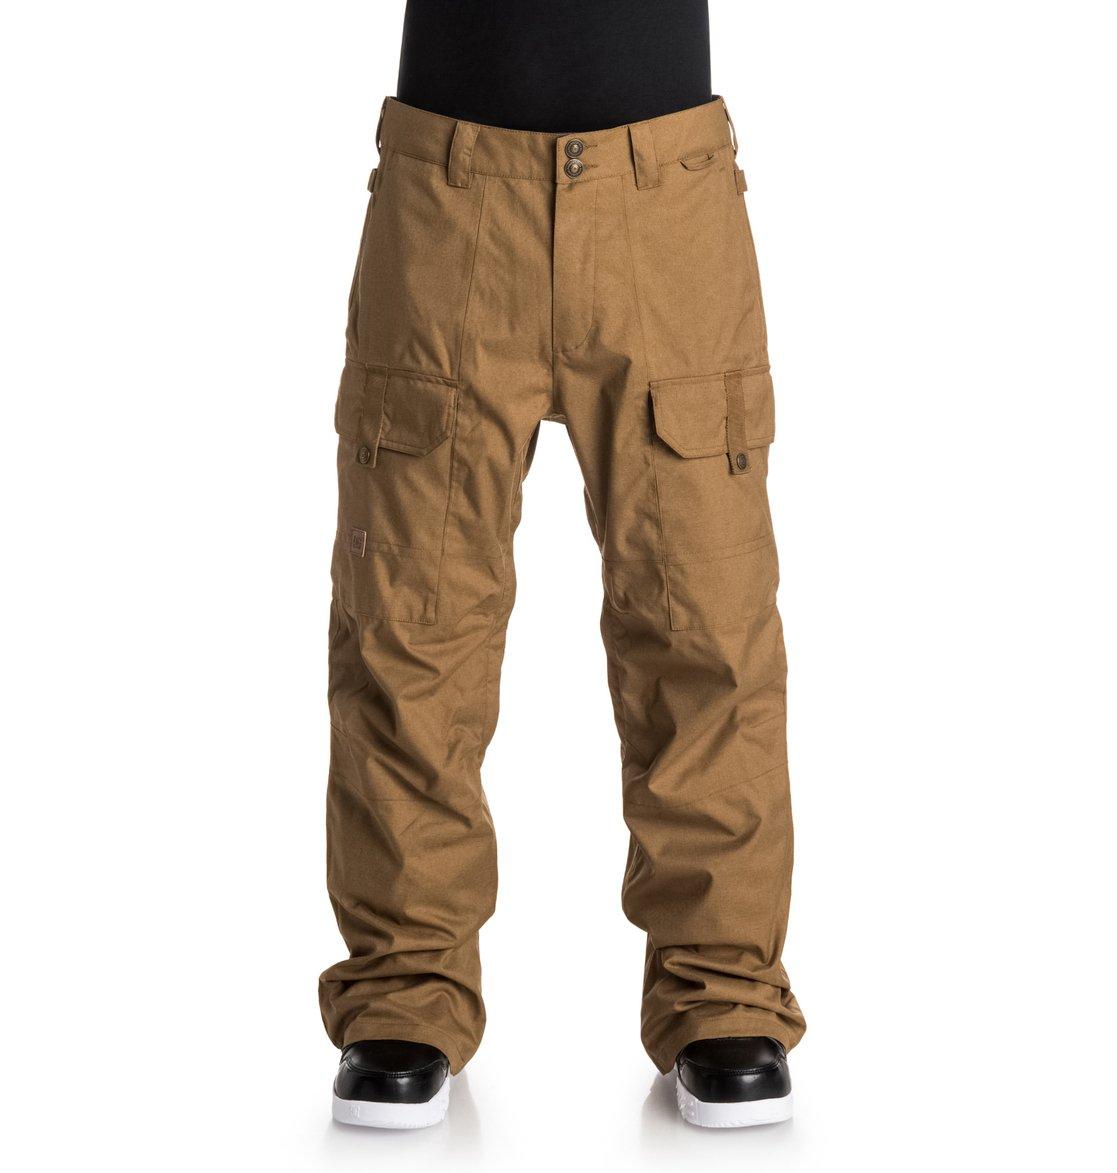 code snow pants 3613371691134 dc shoes. Black Bedroom Furniture Sets. Home Design Ideas